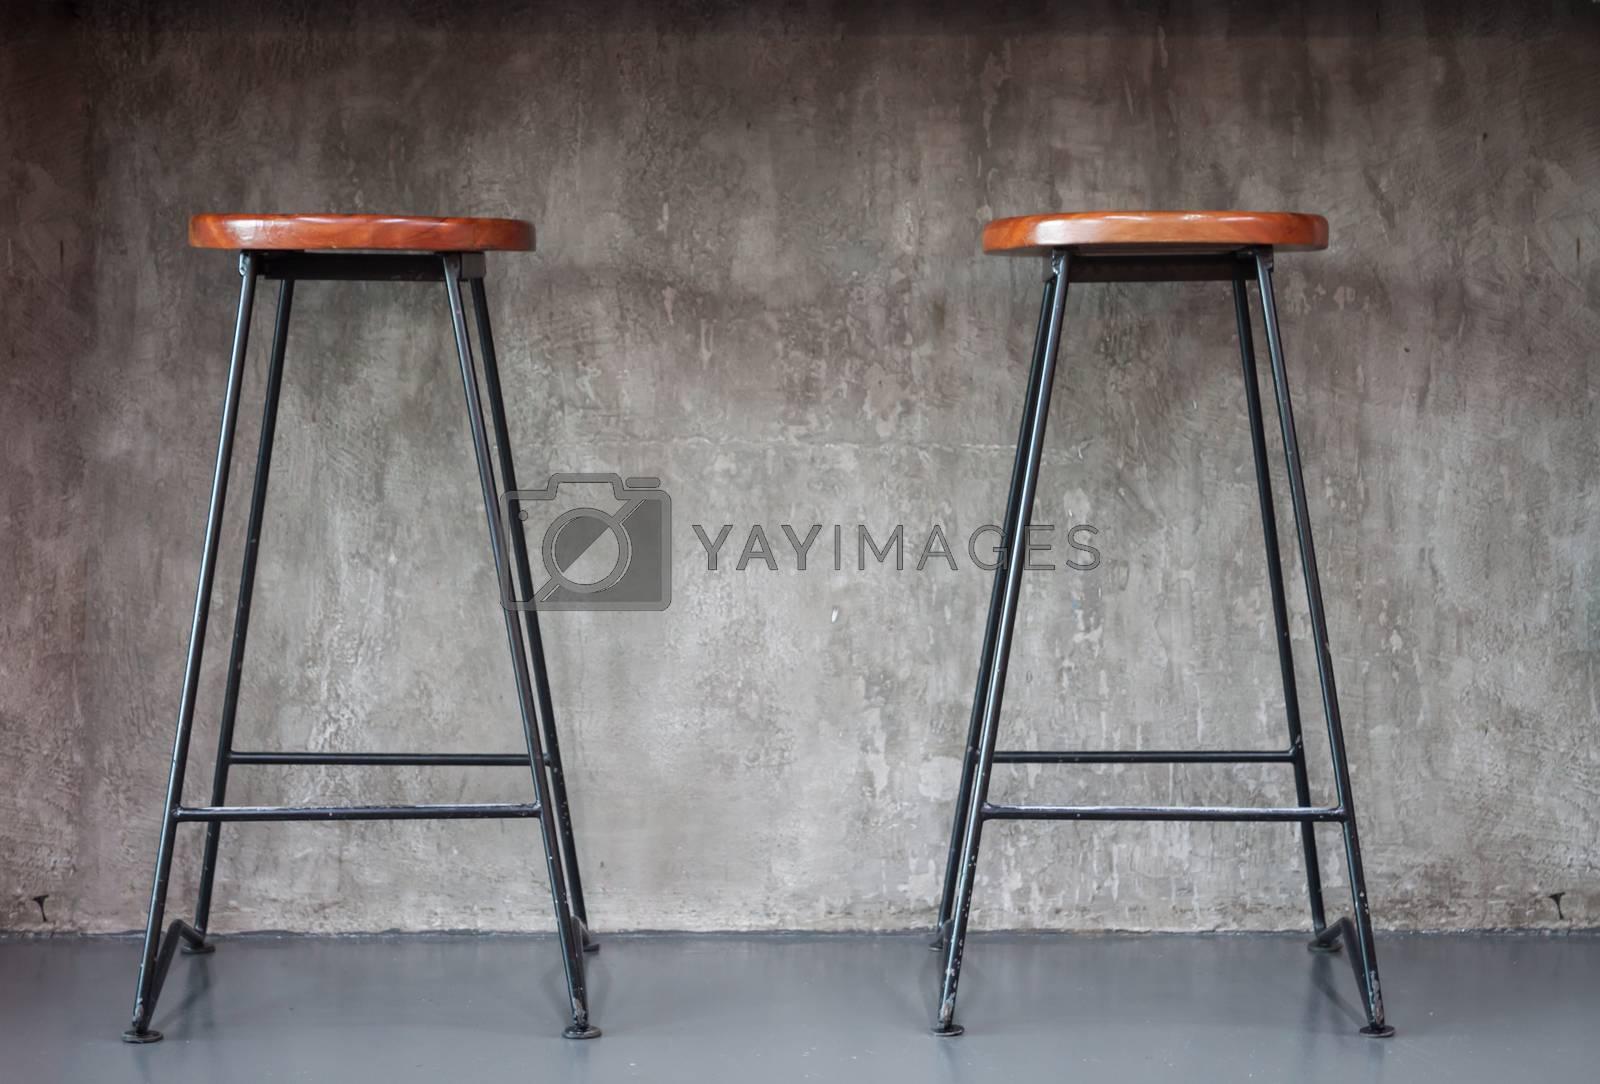 Elegant chairs with empty concrete background, stock photo